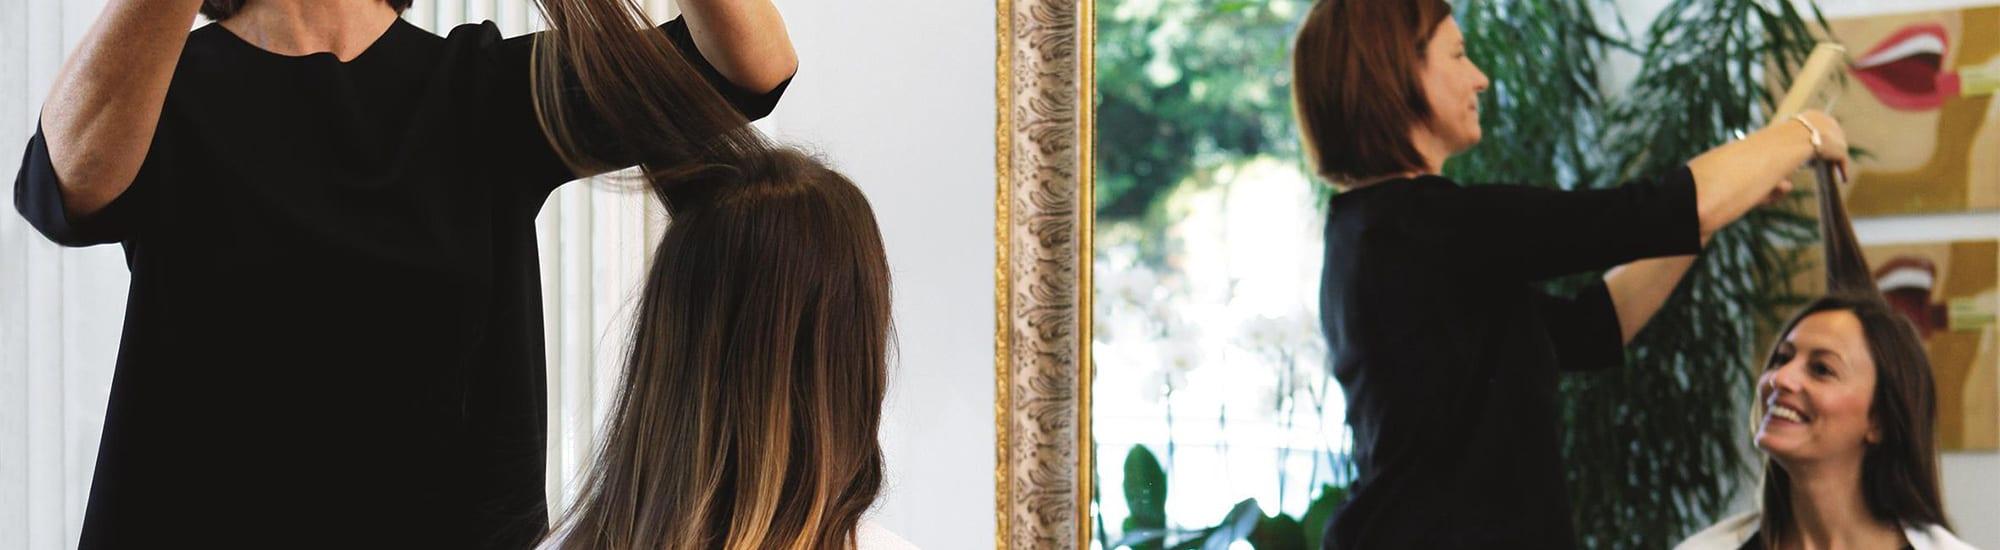 myPRO small business hairdresser